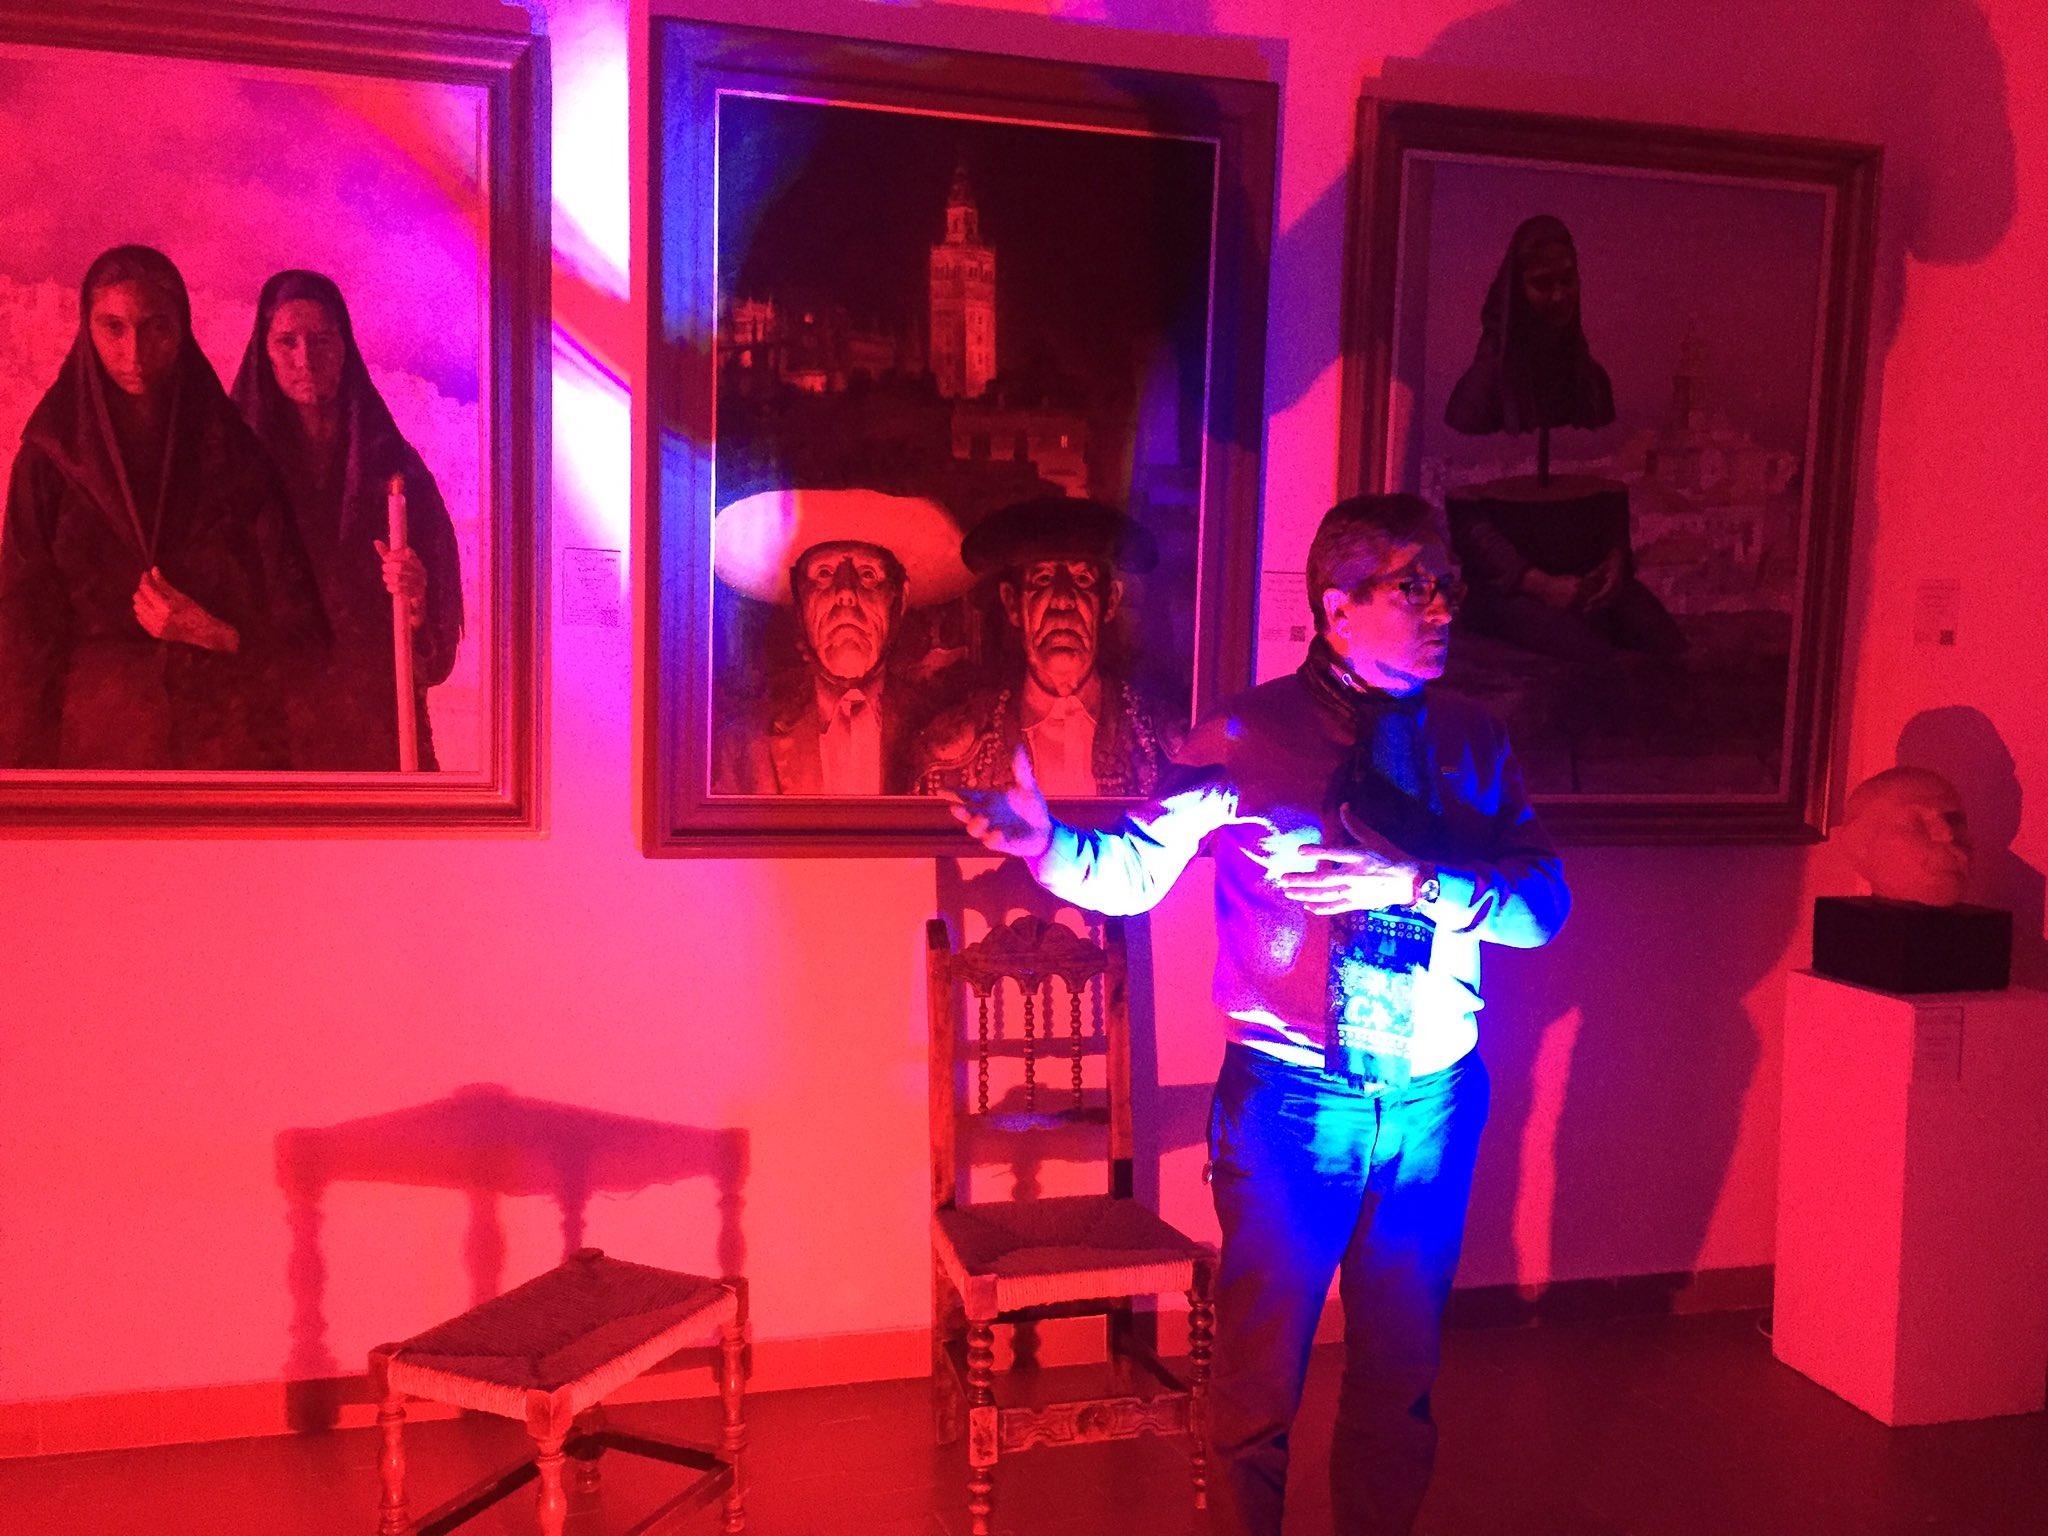 'La novia del baile' teatro en @museoamalio https://t.co/Sxtzu7w6Iu https://t.co/vHFSHNG9E2